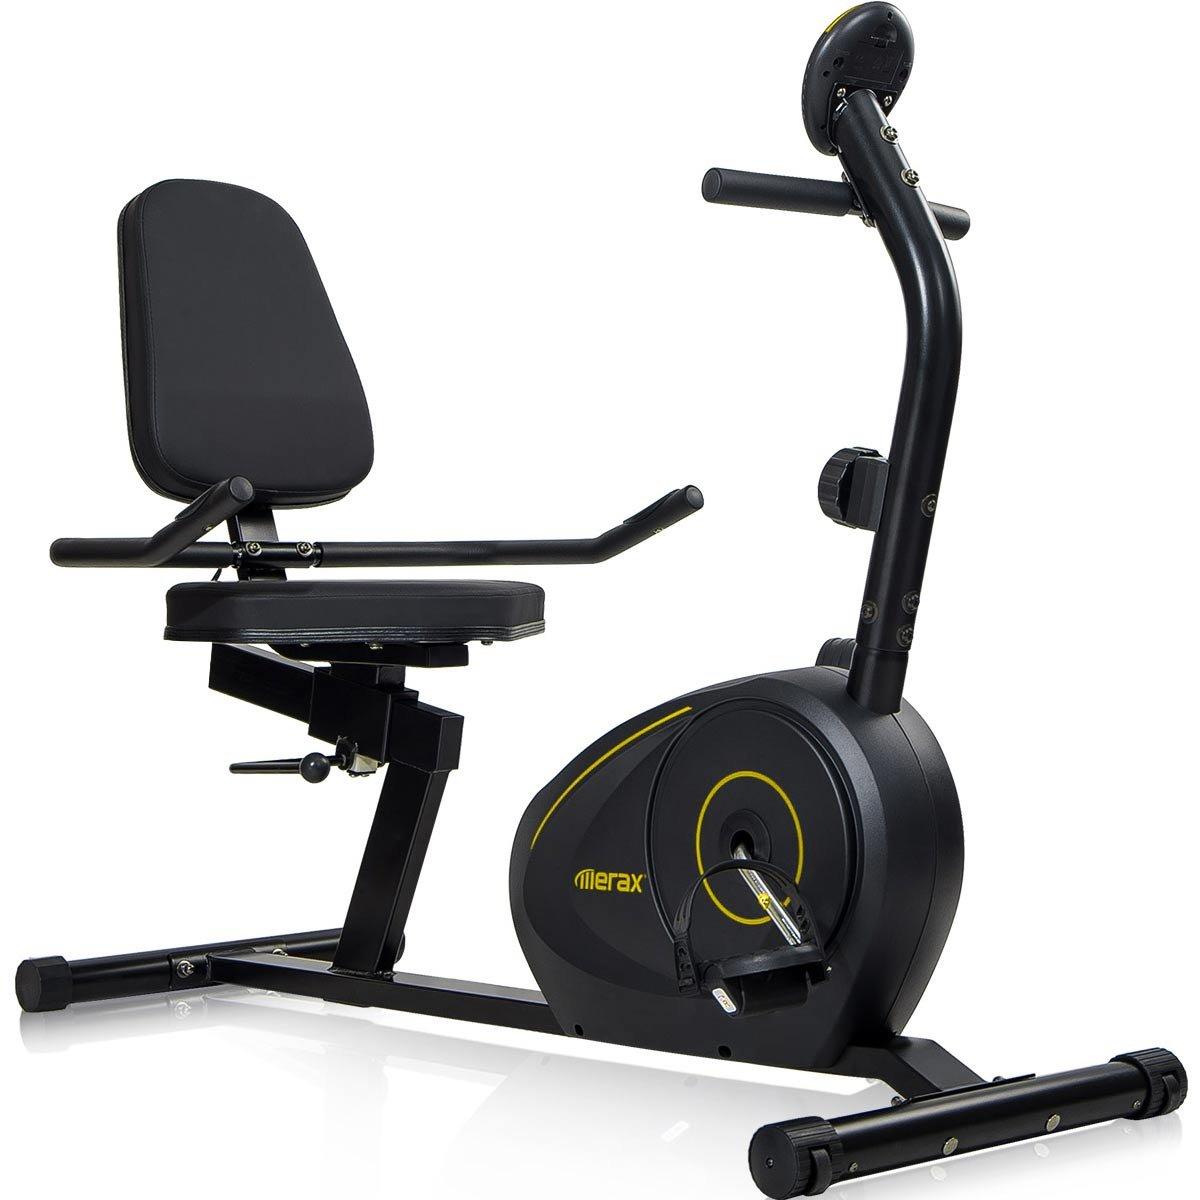 Merax Magnetic Recumbent Exercise Bike | 8-Level Resistance | Quick Adjust Seat (Black 2019) by Merax (Image #2)